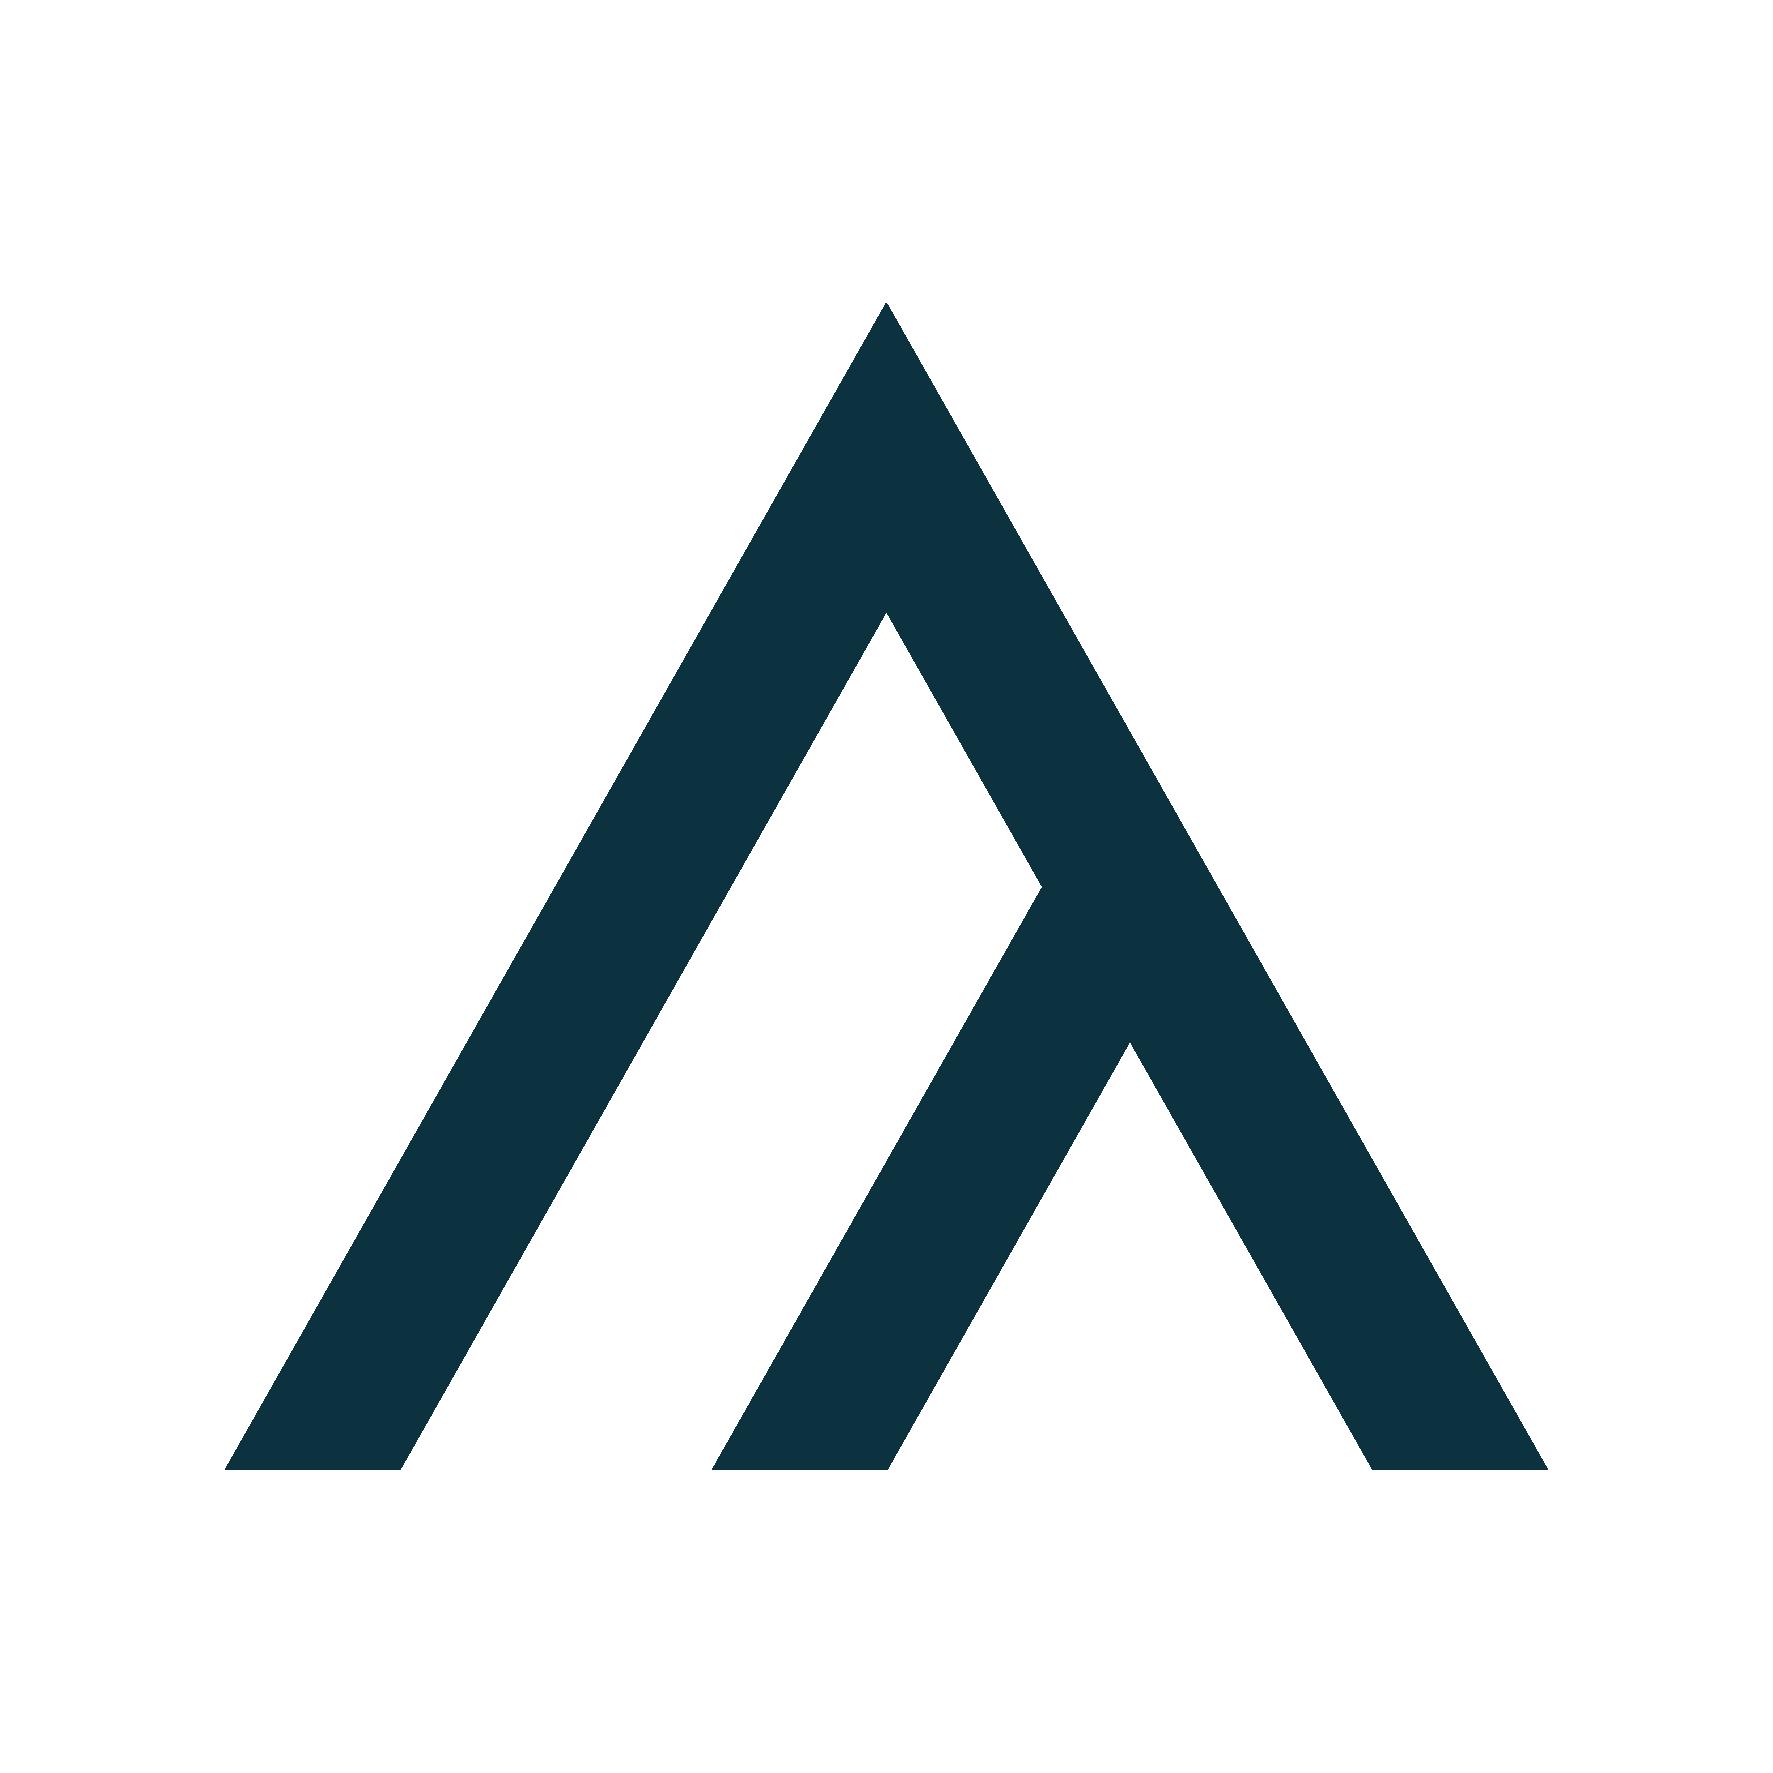 schage_logo_symbol_blue_symbol-positiv